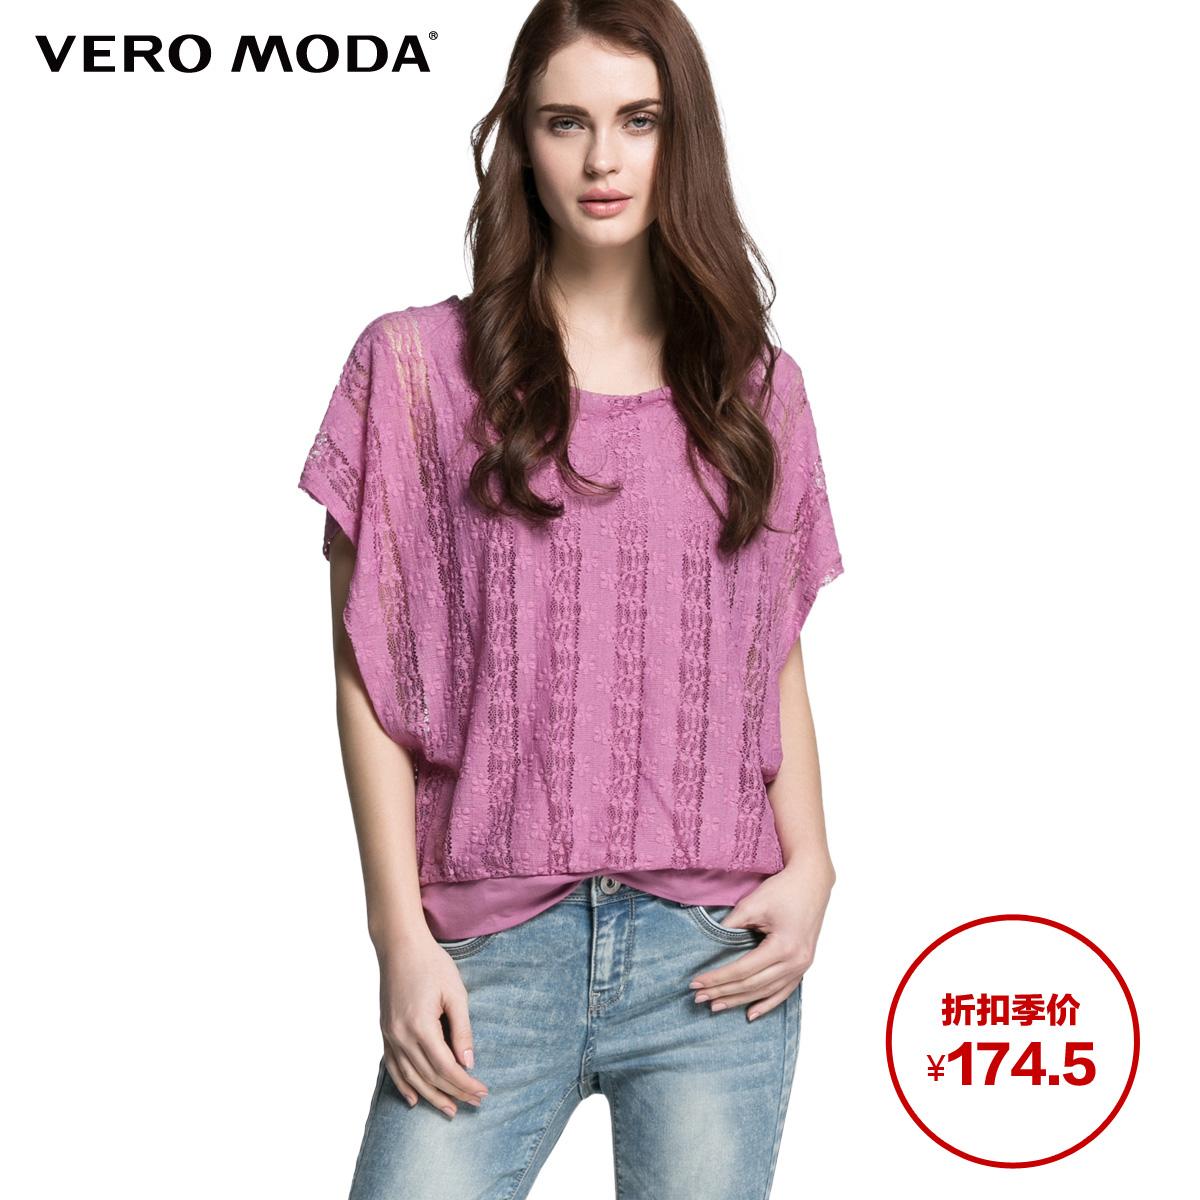 Футболка VERO MODA 315201024 174.5 !VeroModa футболка vero moda цвет черный